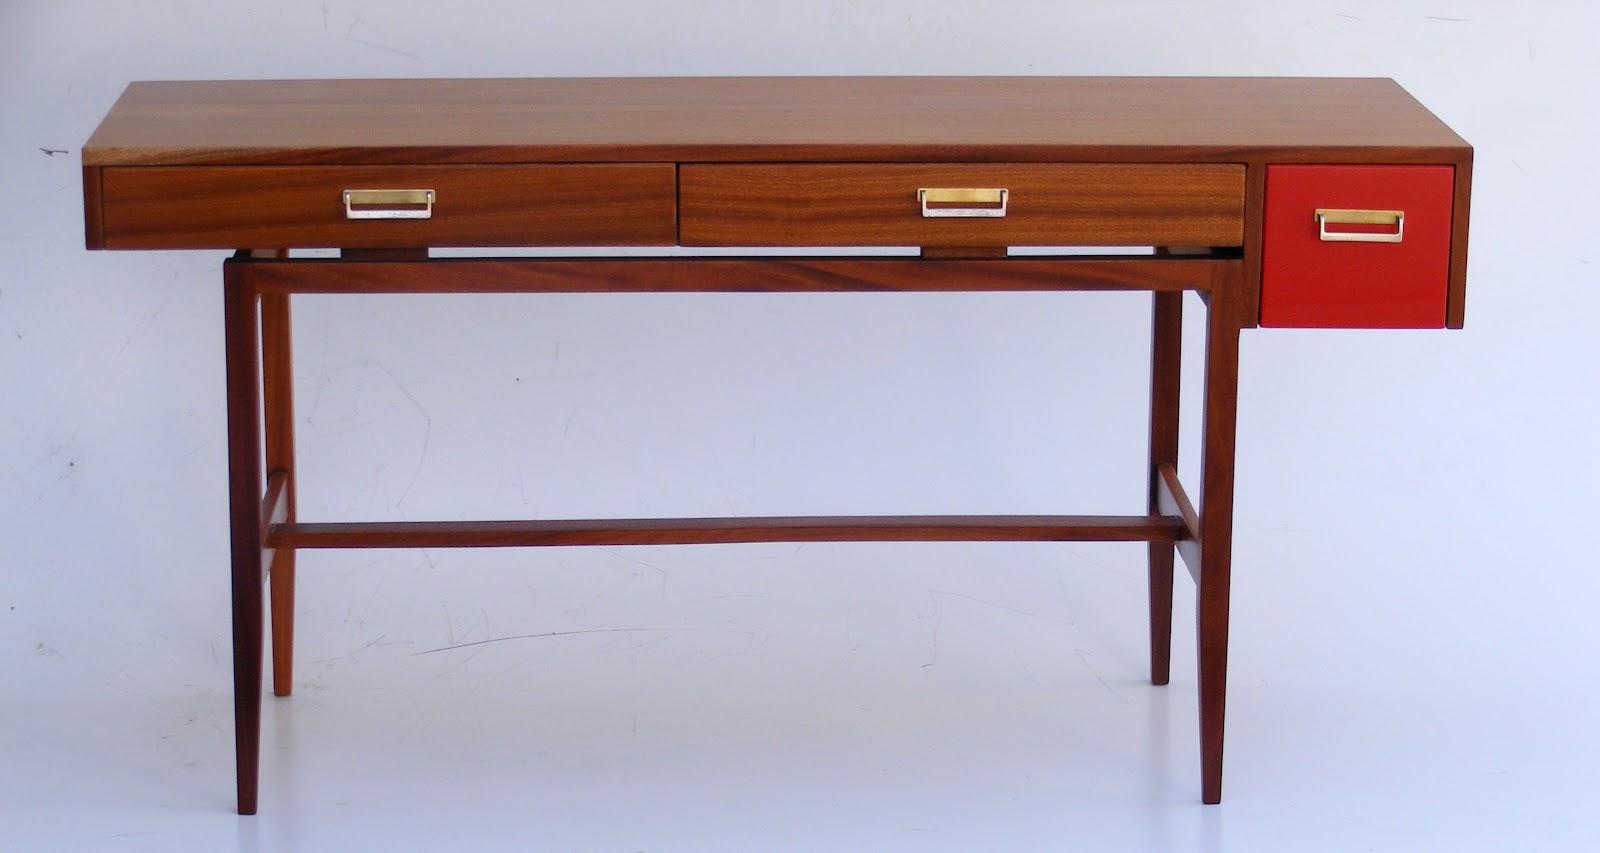 VAMP FURNITURE new revamped vintage furniture stock at  : PIC8AVAMPDESKR22500016032012 from vampfurniture.blogspot.co.nz size 1600 x 853 jpeg 95kB